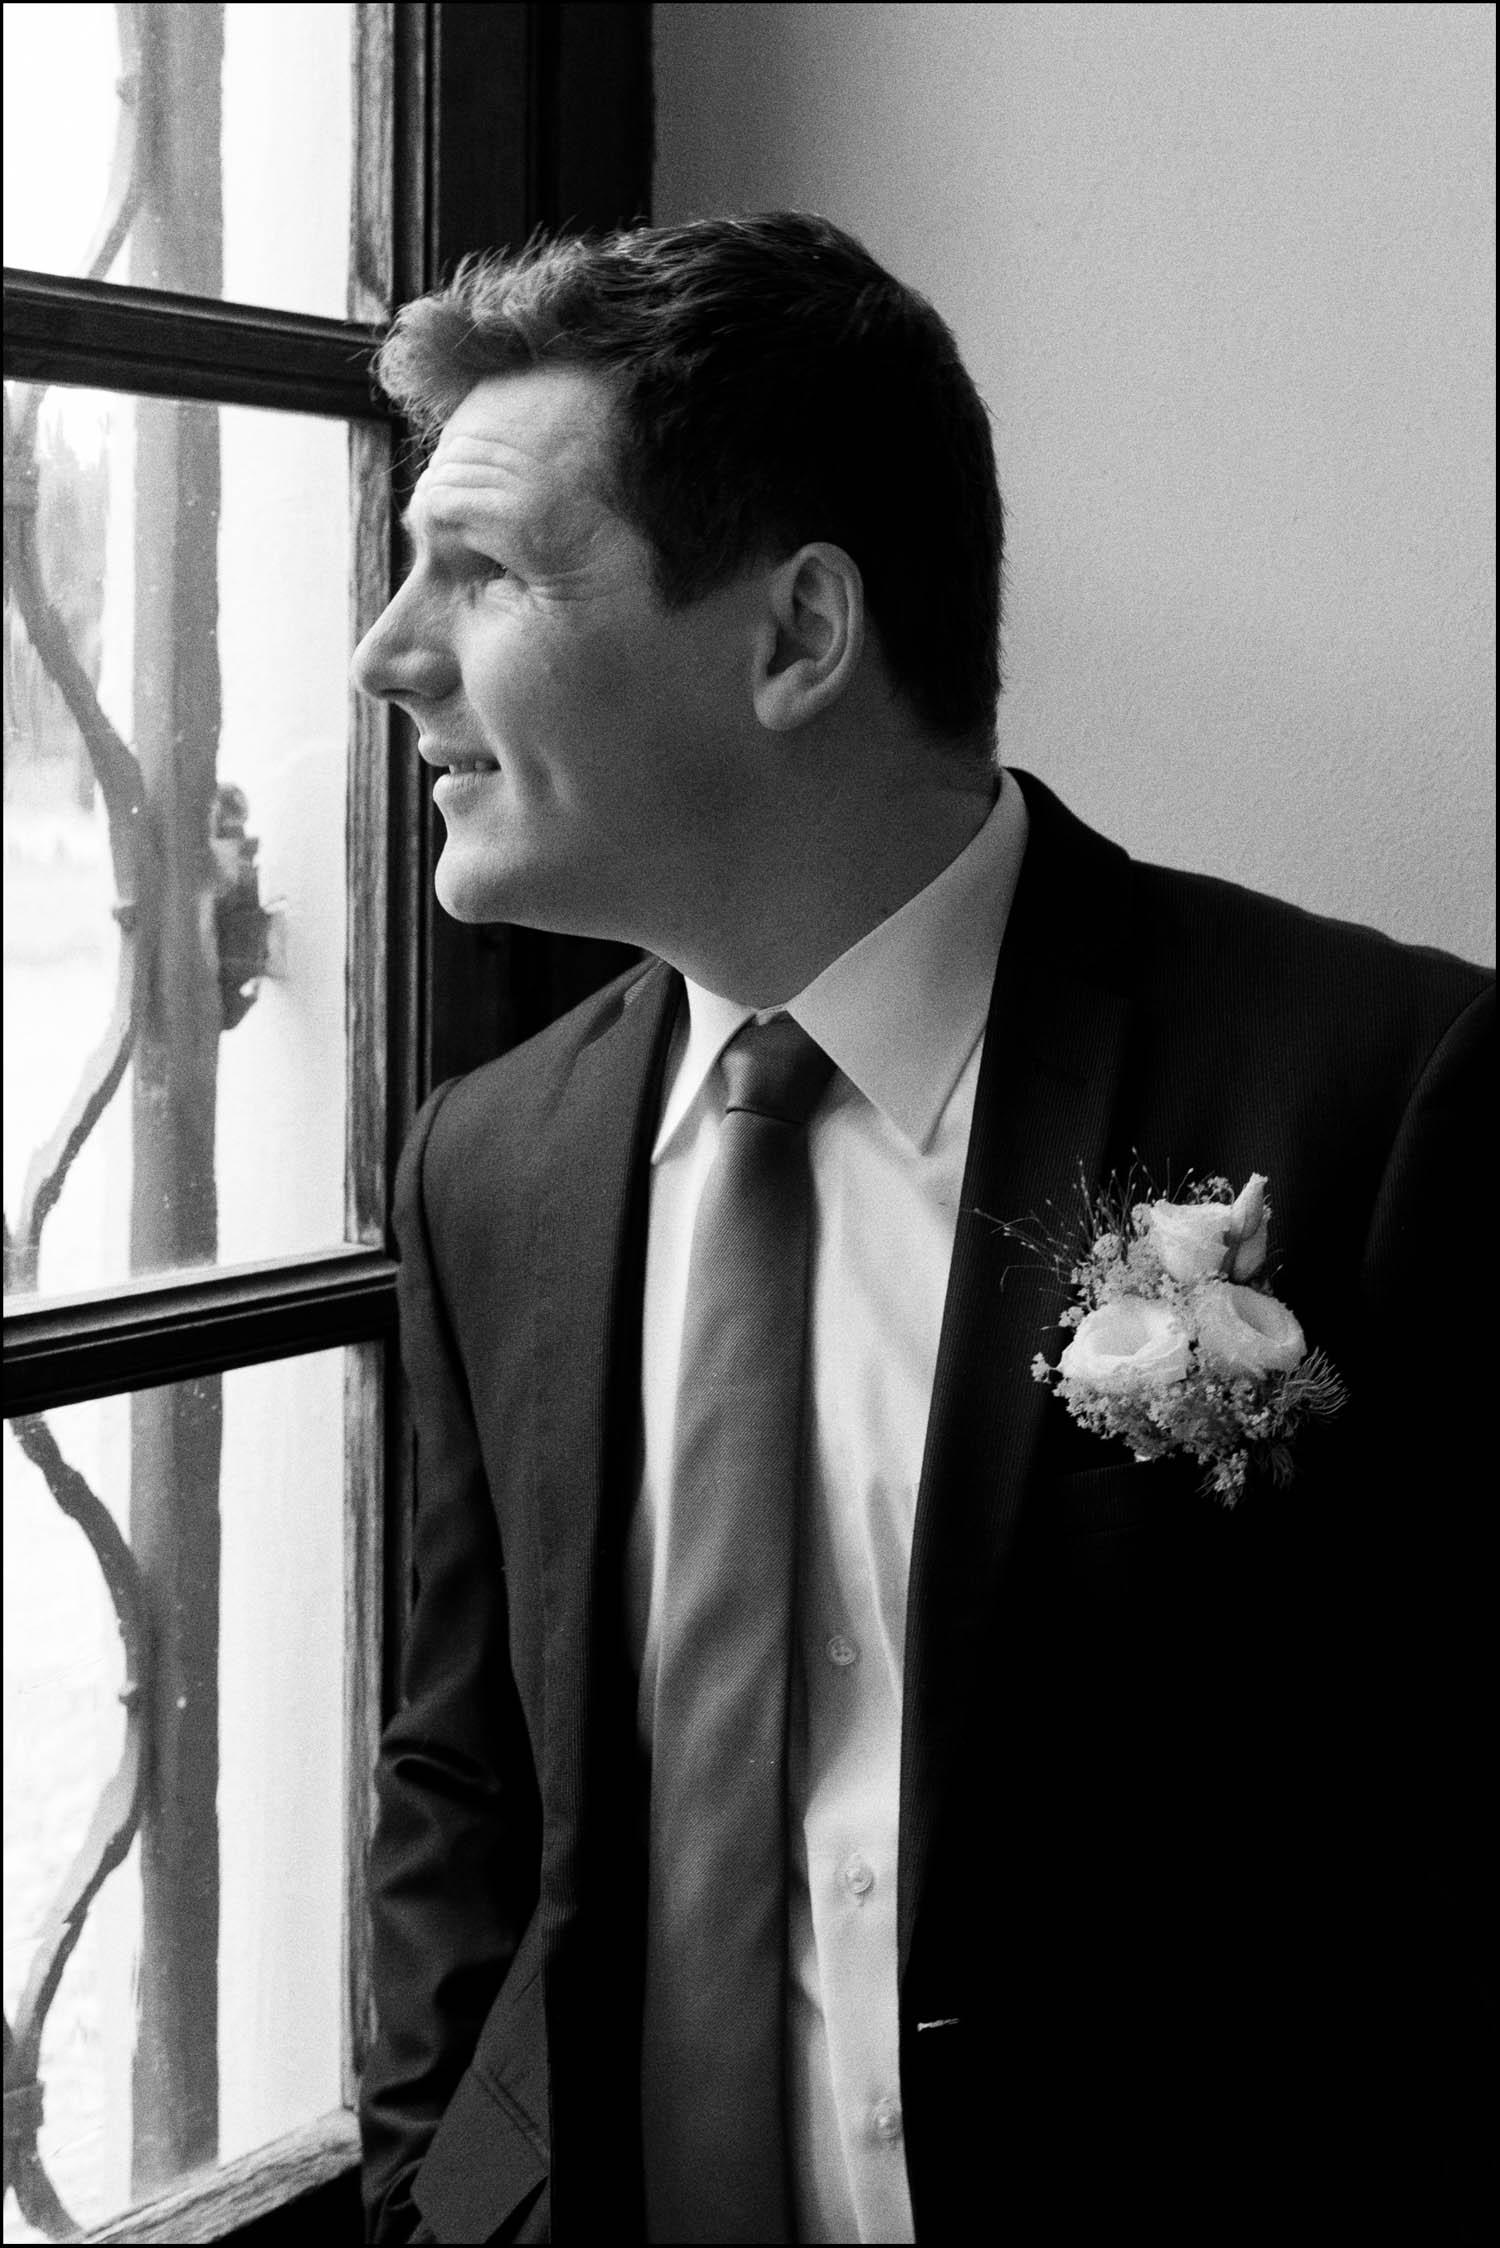 Gregg_Wedding_6.jpg